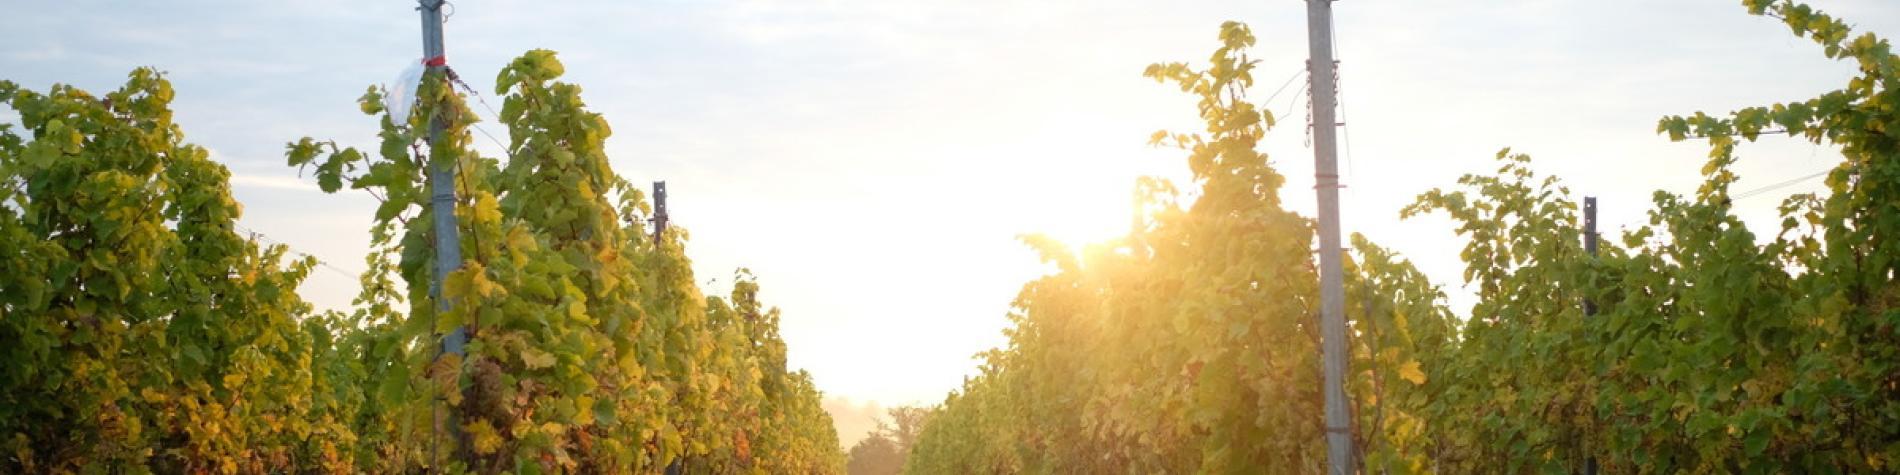 Liege Wine - Discover Belgium - Vins wallons